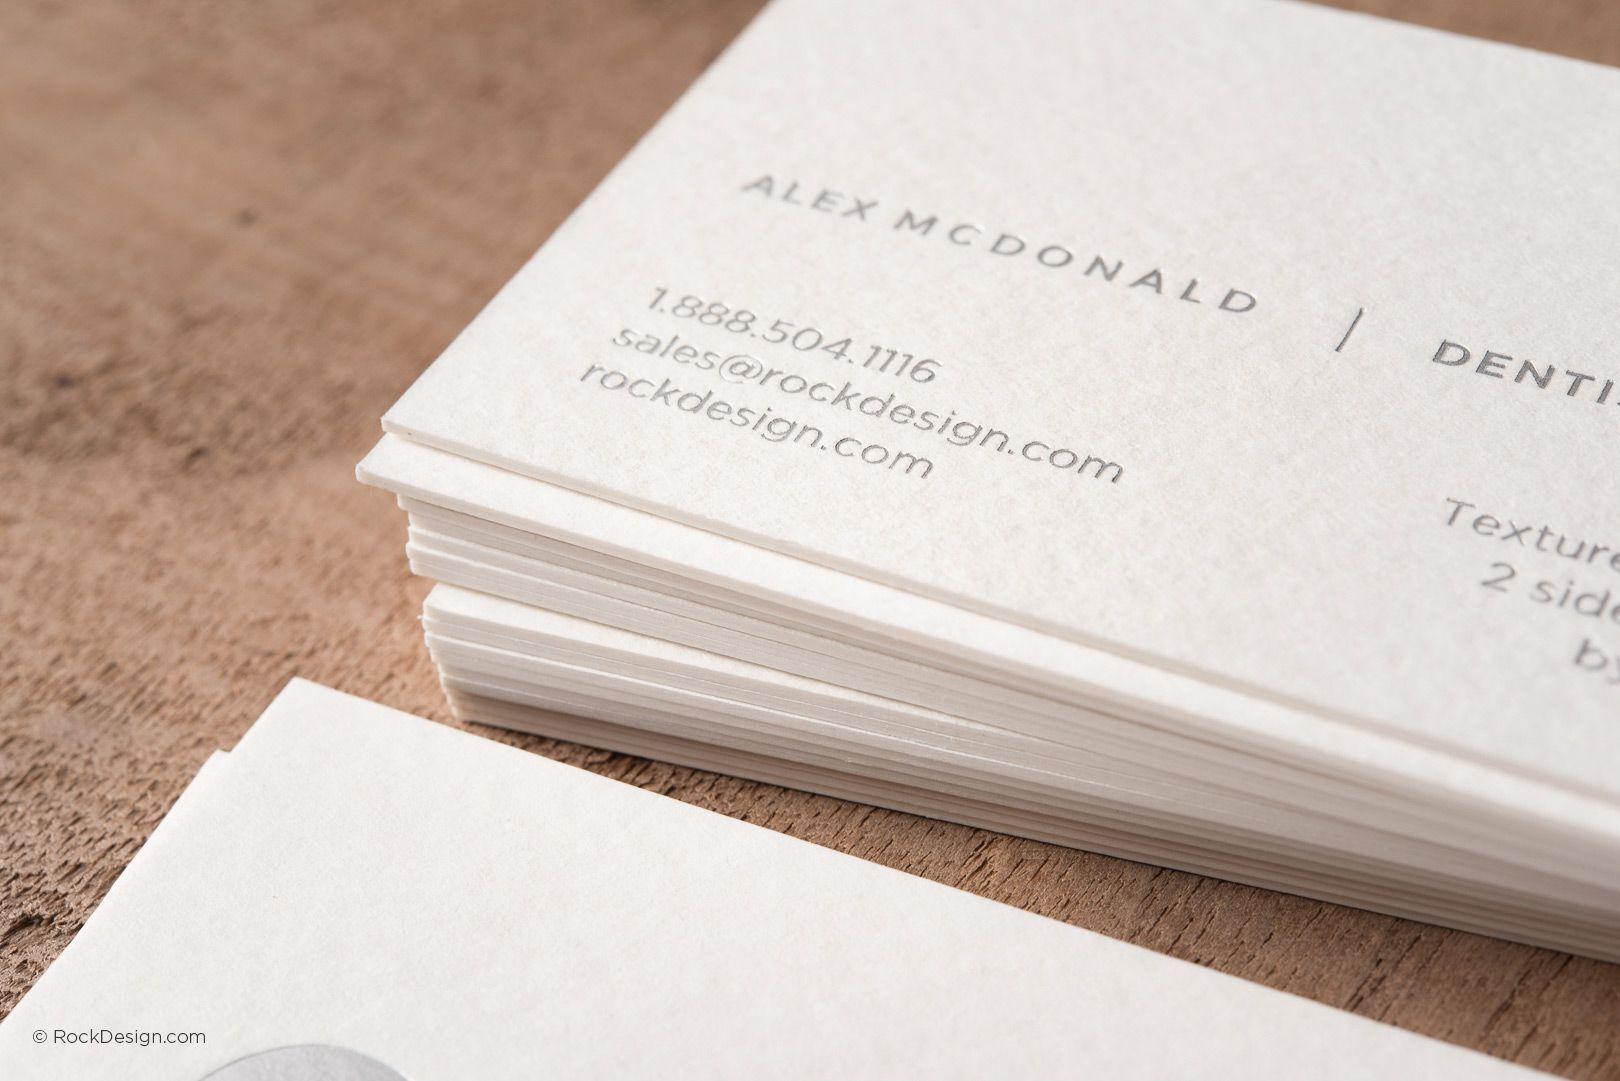 Modern minimalist textured cream business card with silver foil modern minimalist textured cream business card with silver foil mcdonald dental rockdesign luxury business reheart Images